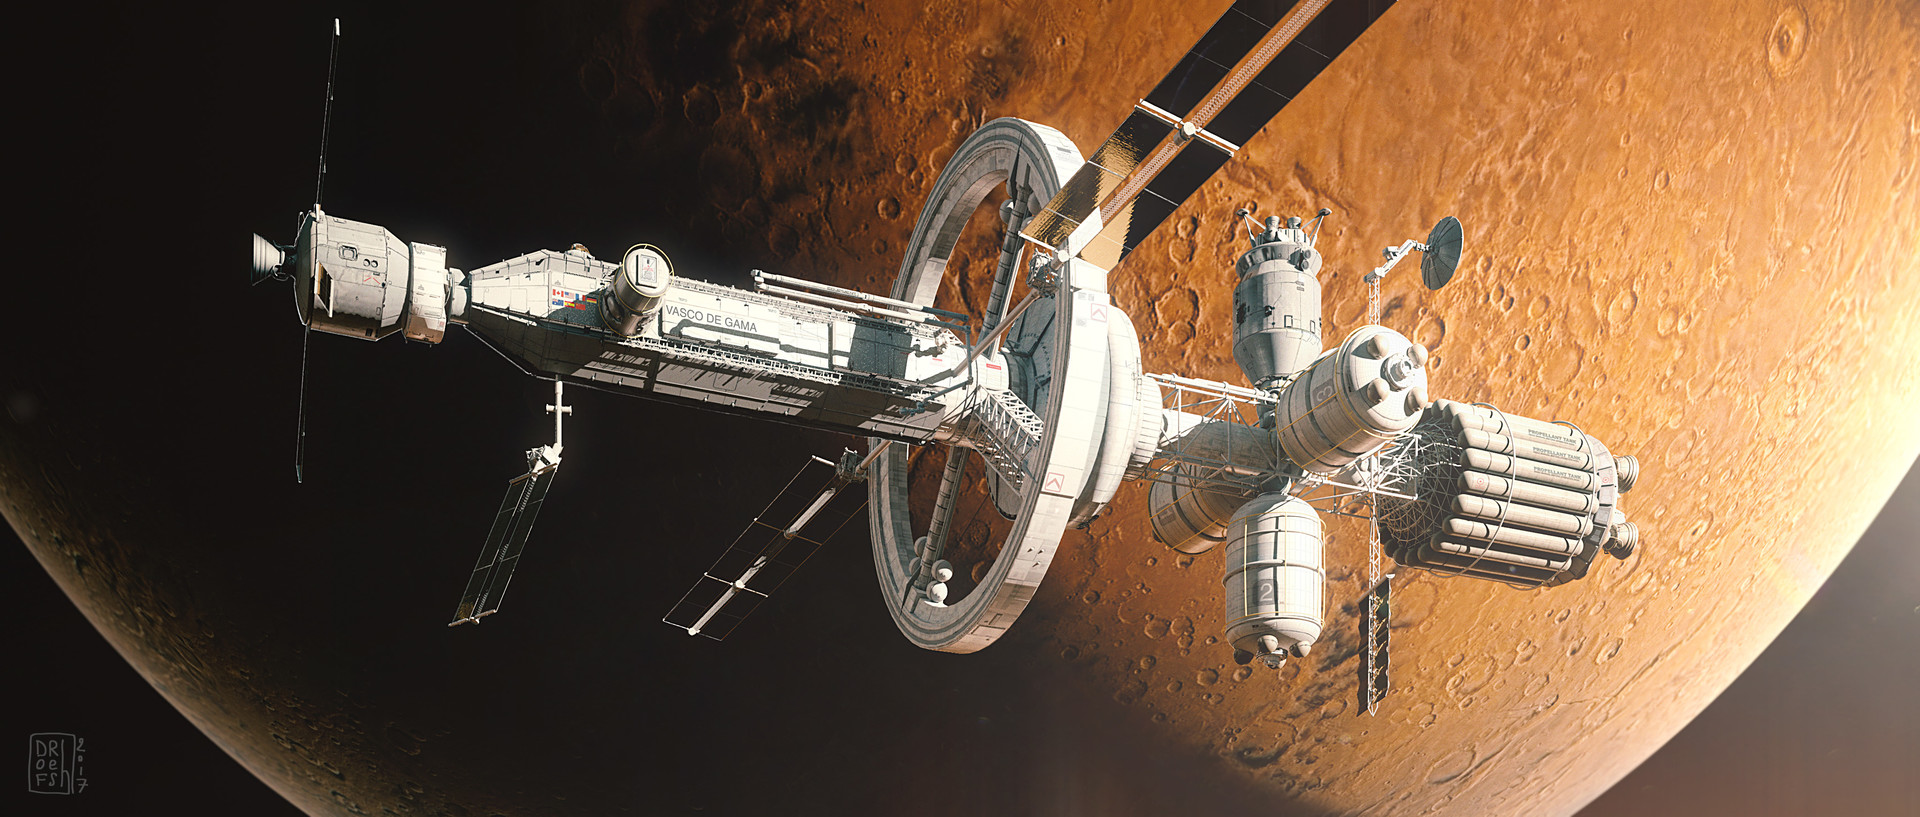 Dofresh missionmars spacehip overmars